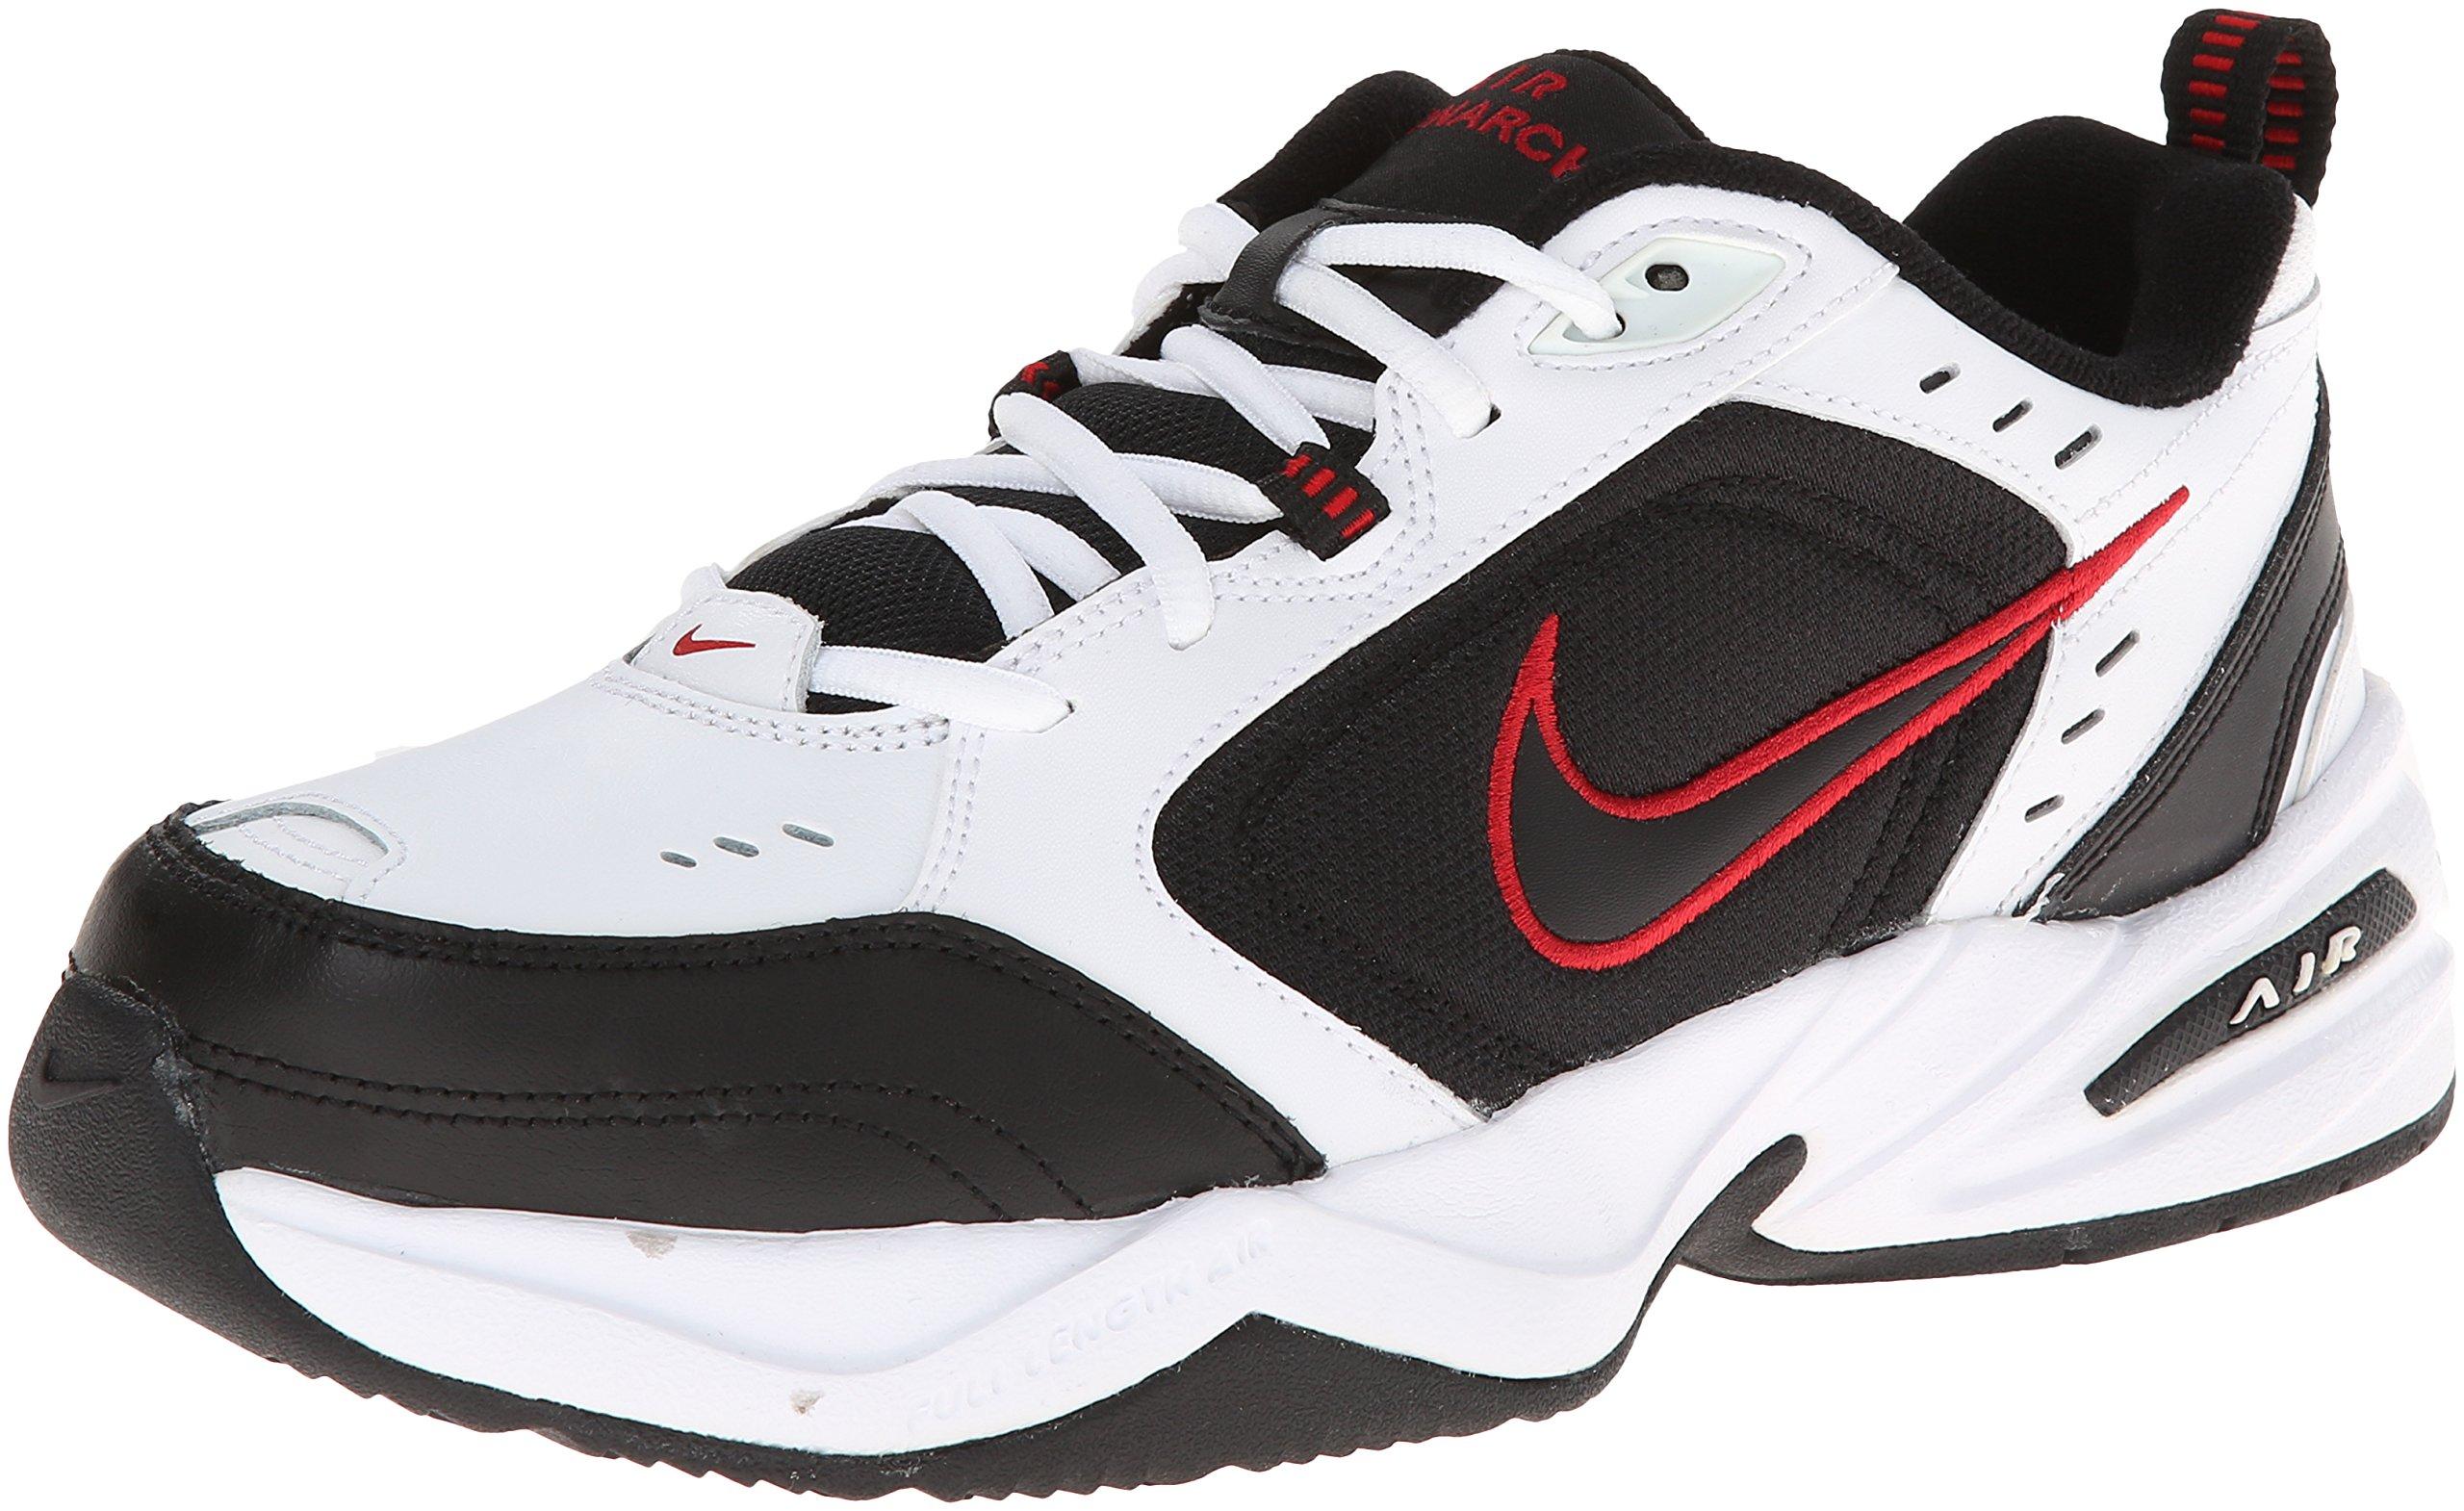 size 40 cd68d 88332 Galleon - Nike Air Monarch IV Training Shoe (4E) - White Black Varsity Red,  Size 10 US